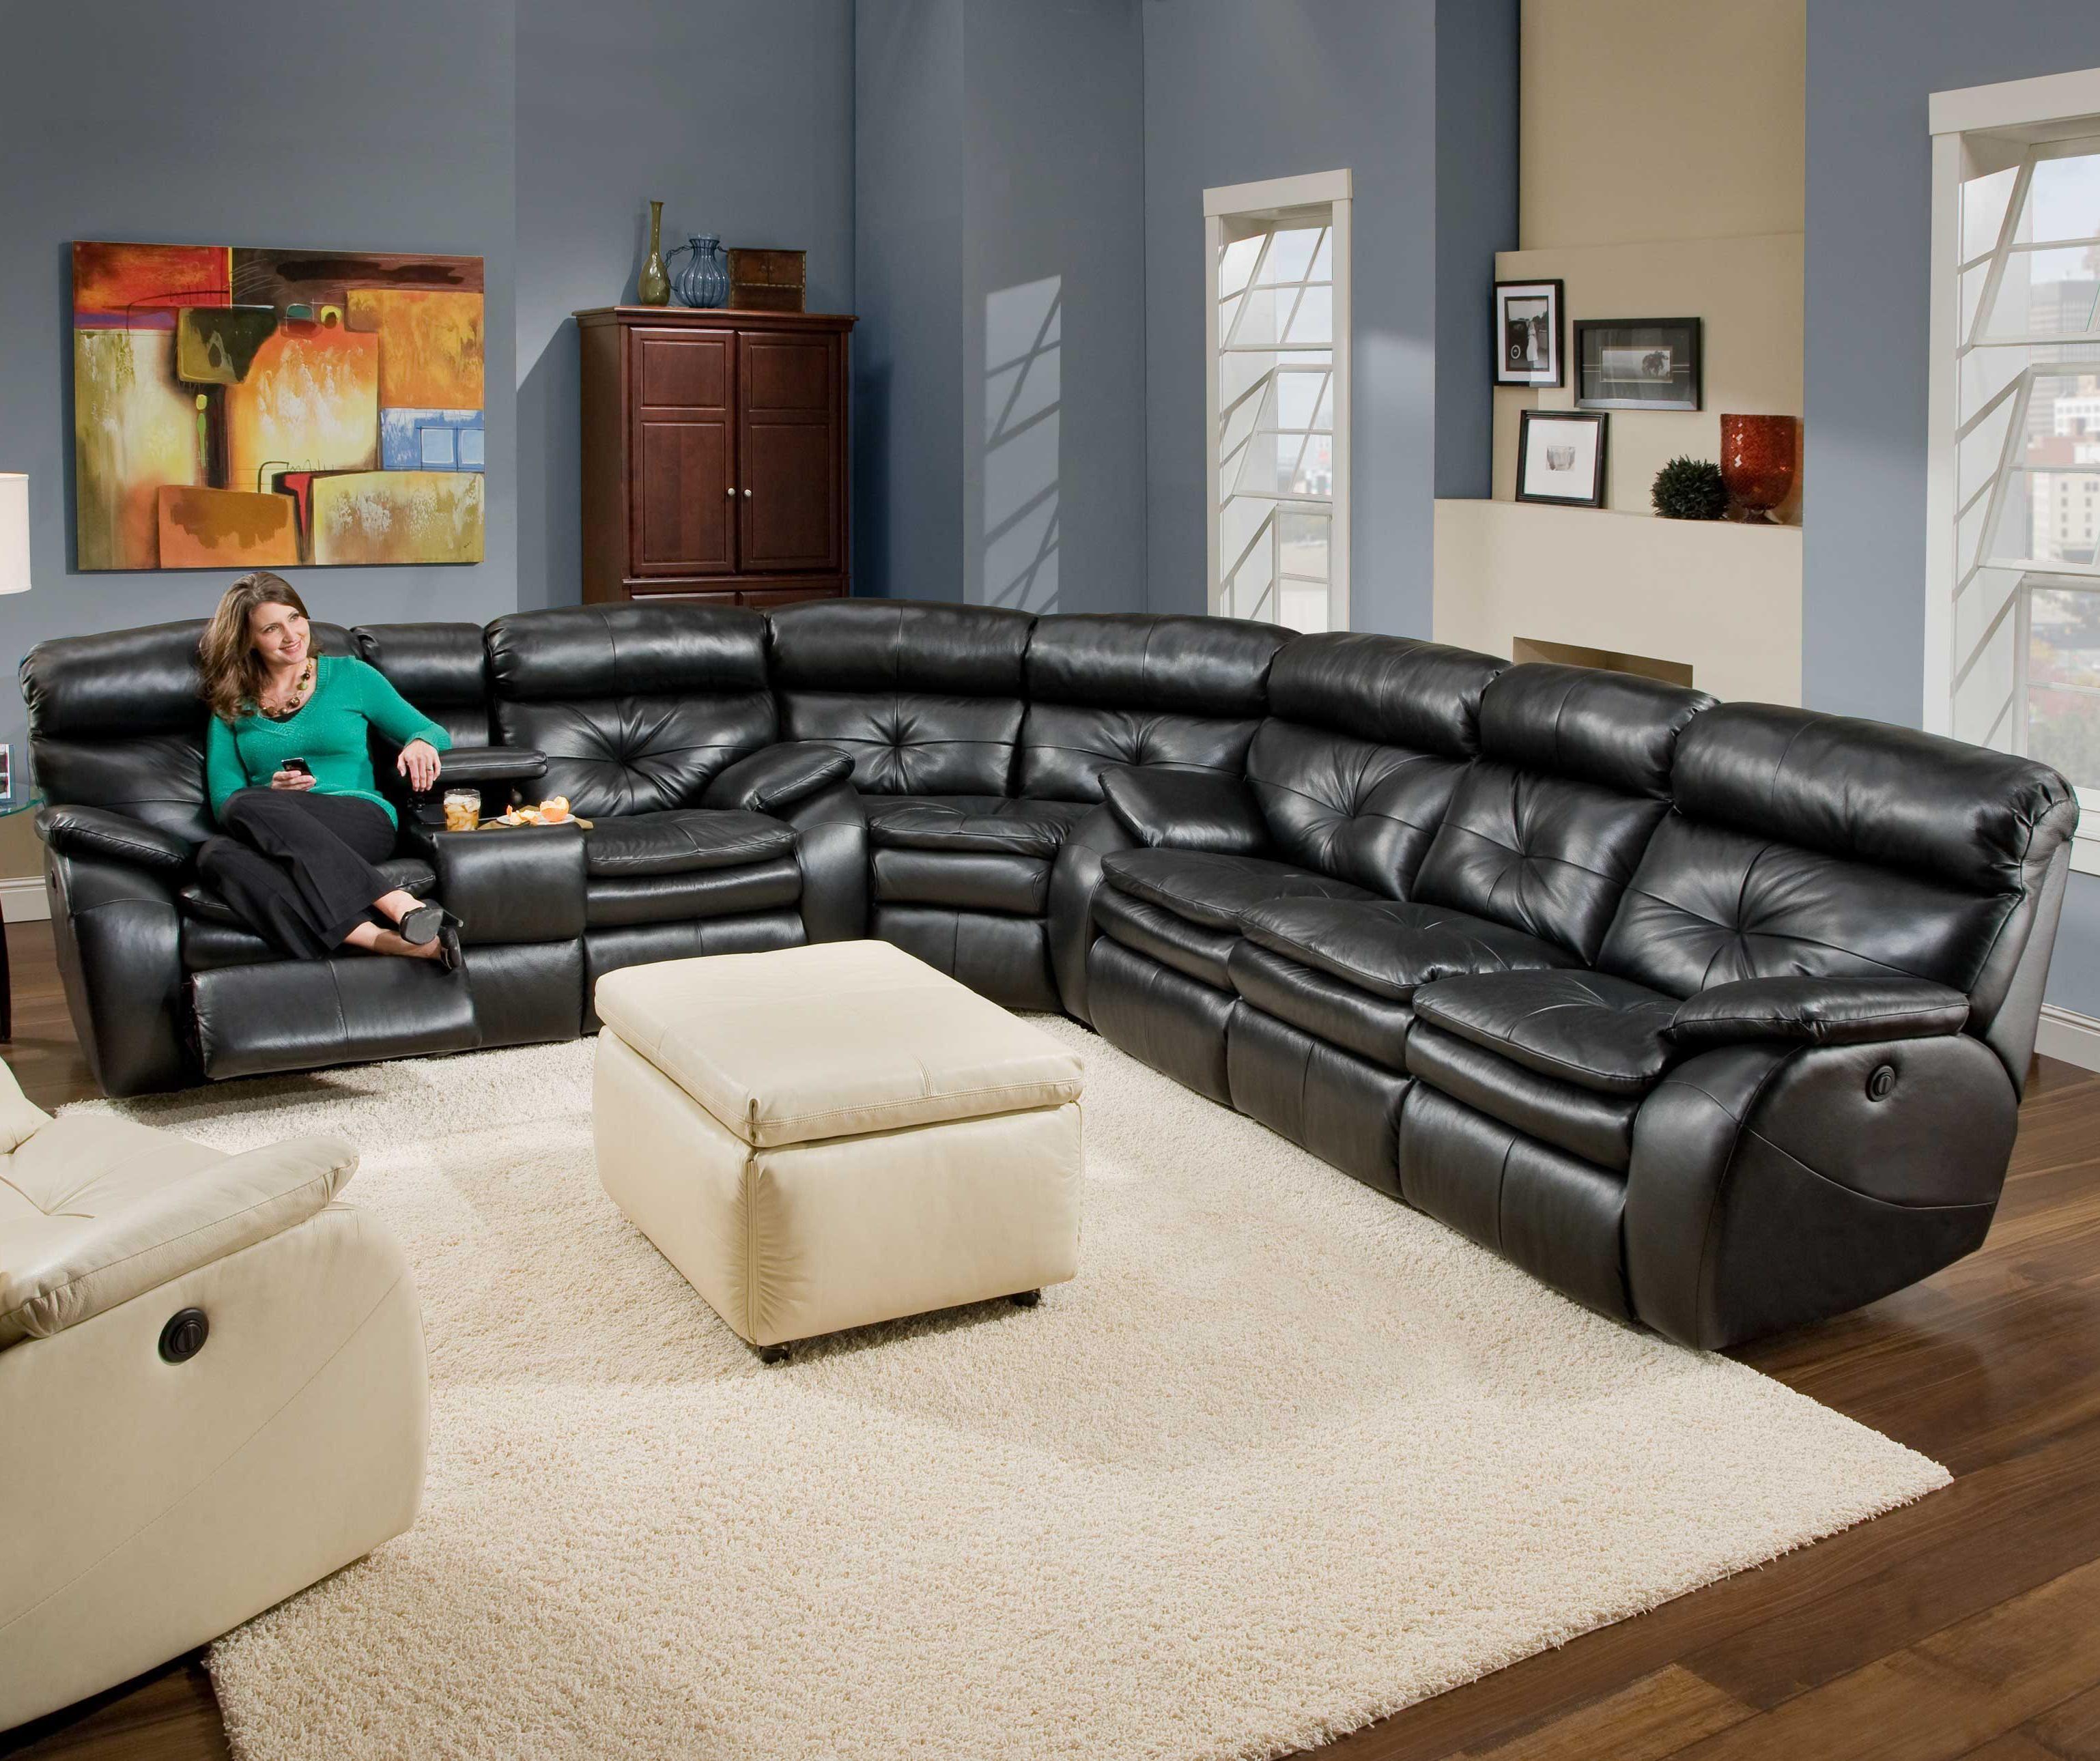 Southern motion jitterbug reclining sofa sectional turk furniture reclining sectional sofa joliet champaign bolingbrook la salle kankakee